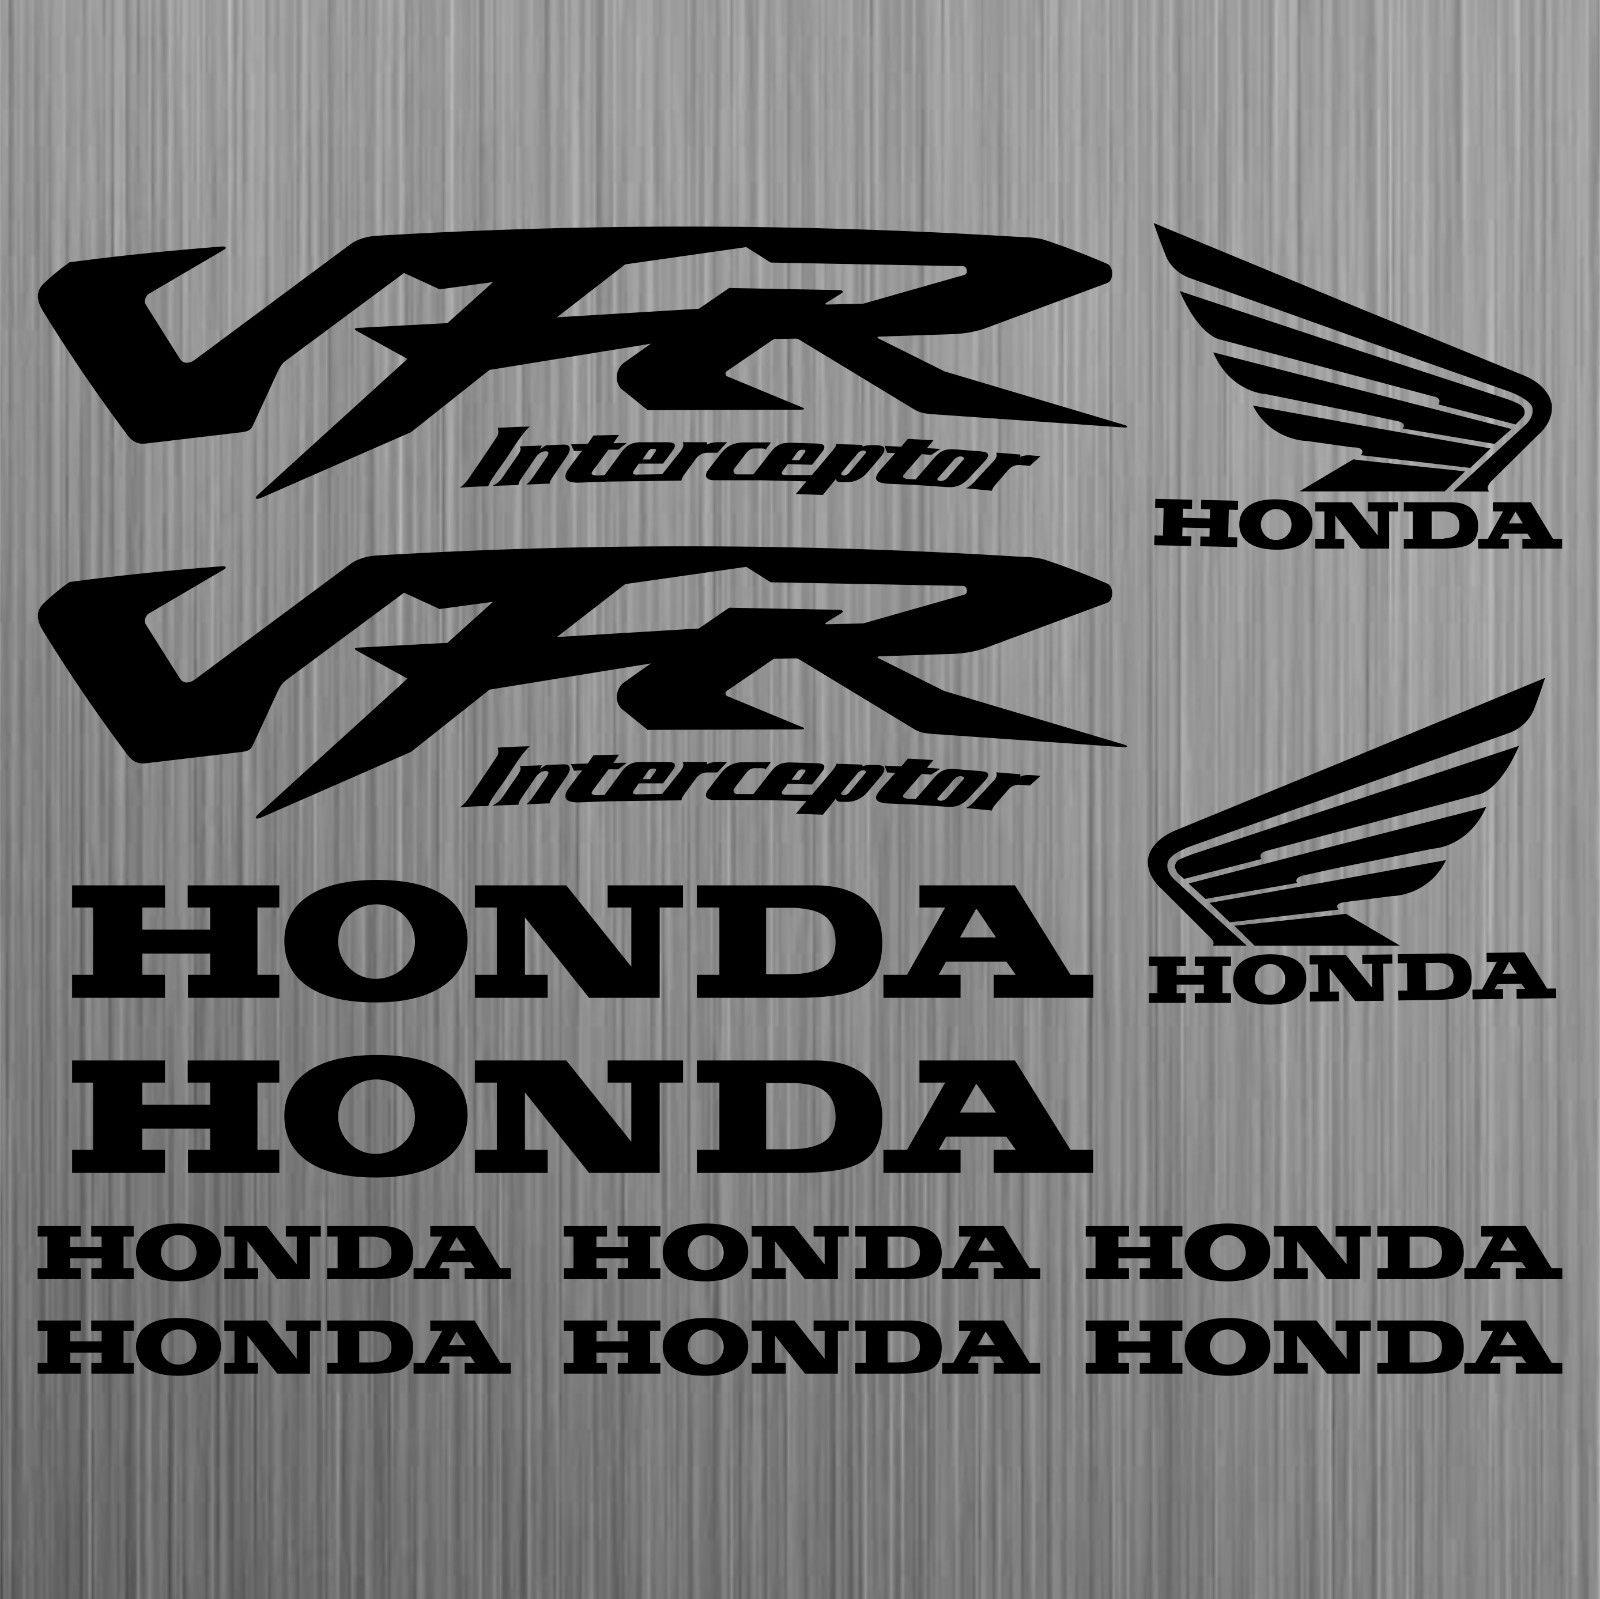 HONDA VFR Interceptor sticker decal motorcycle 12 Pieces